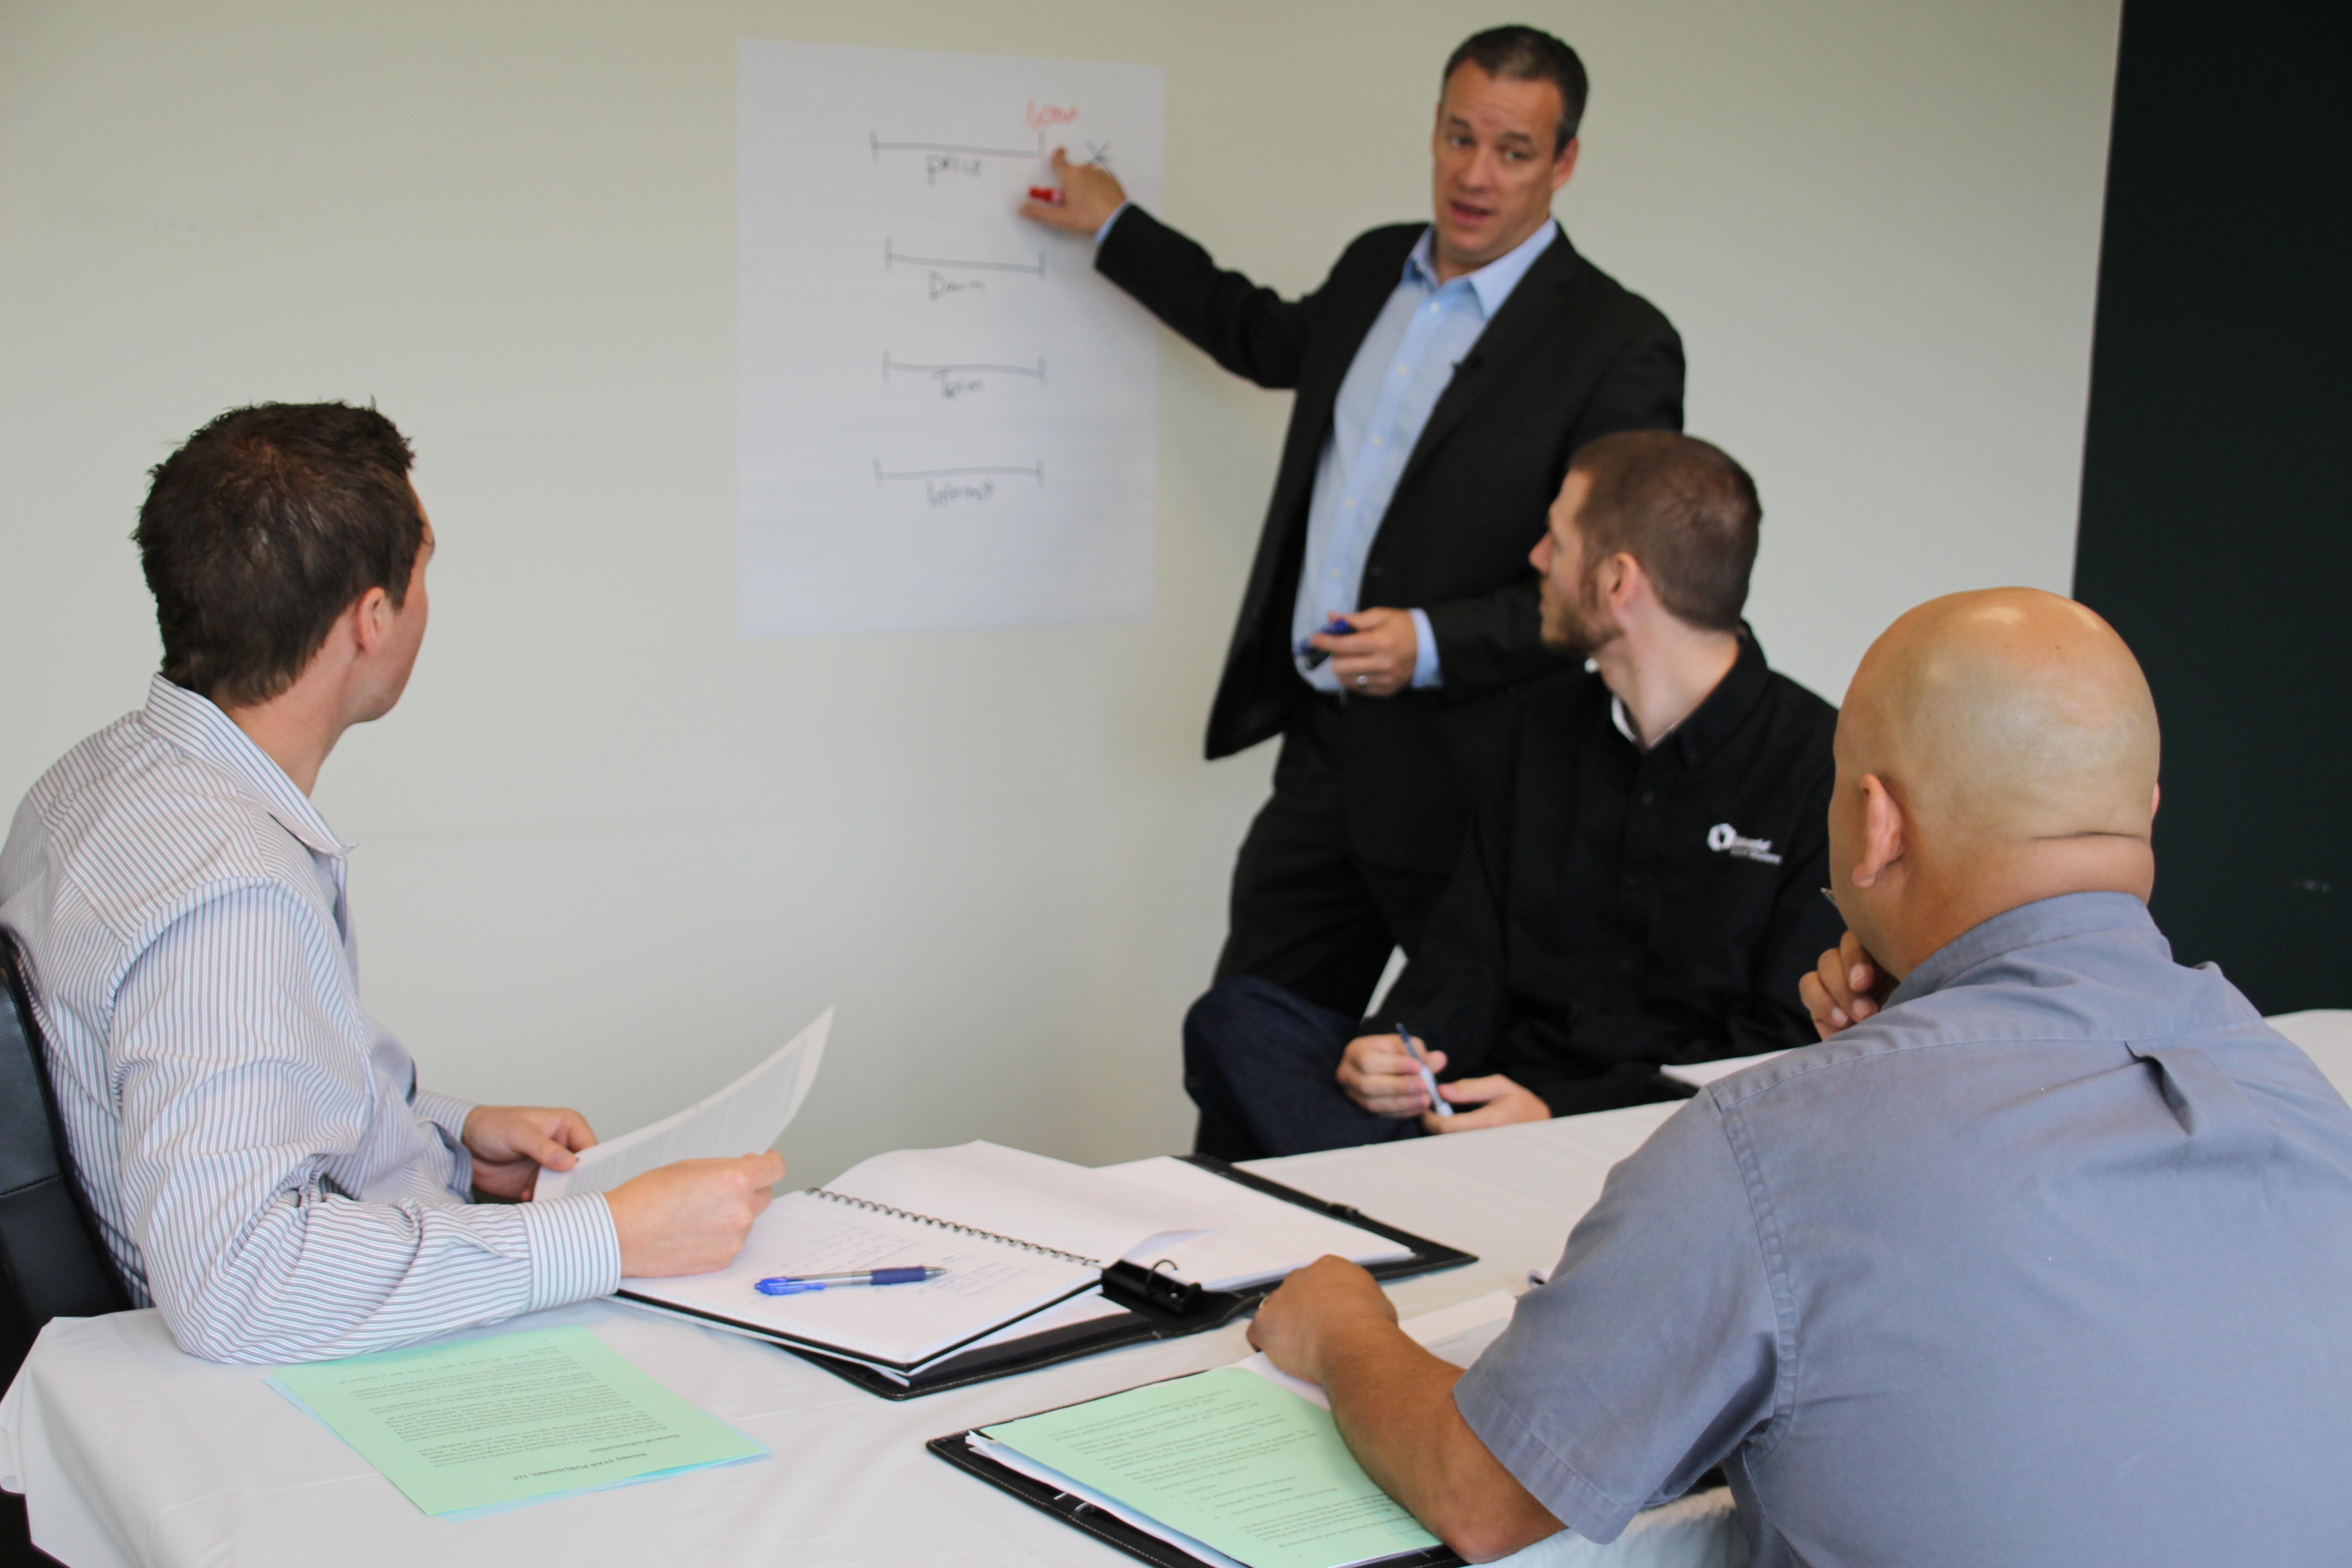 negotiation skills seminar break out session